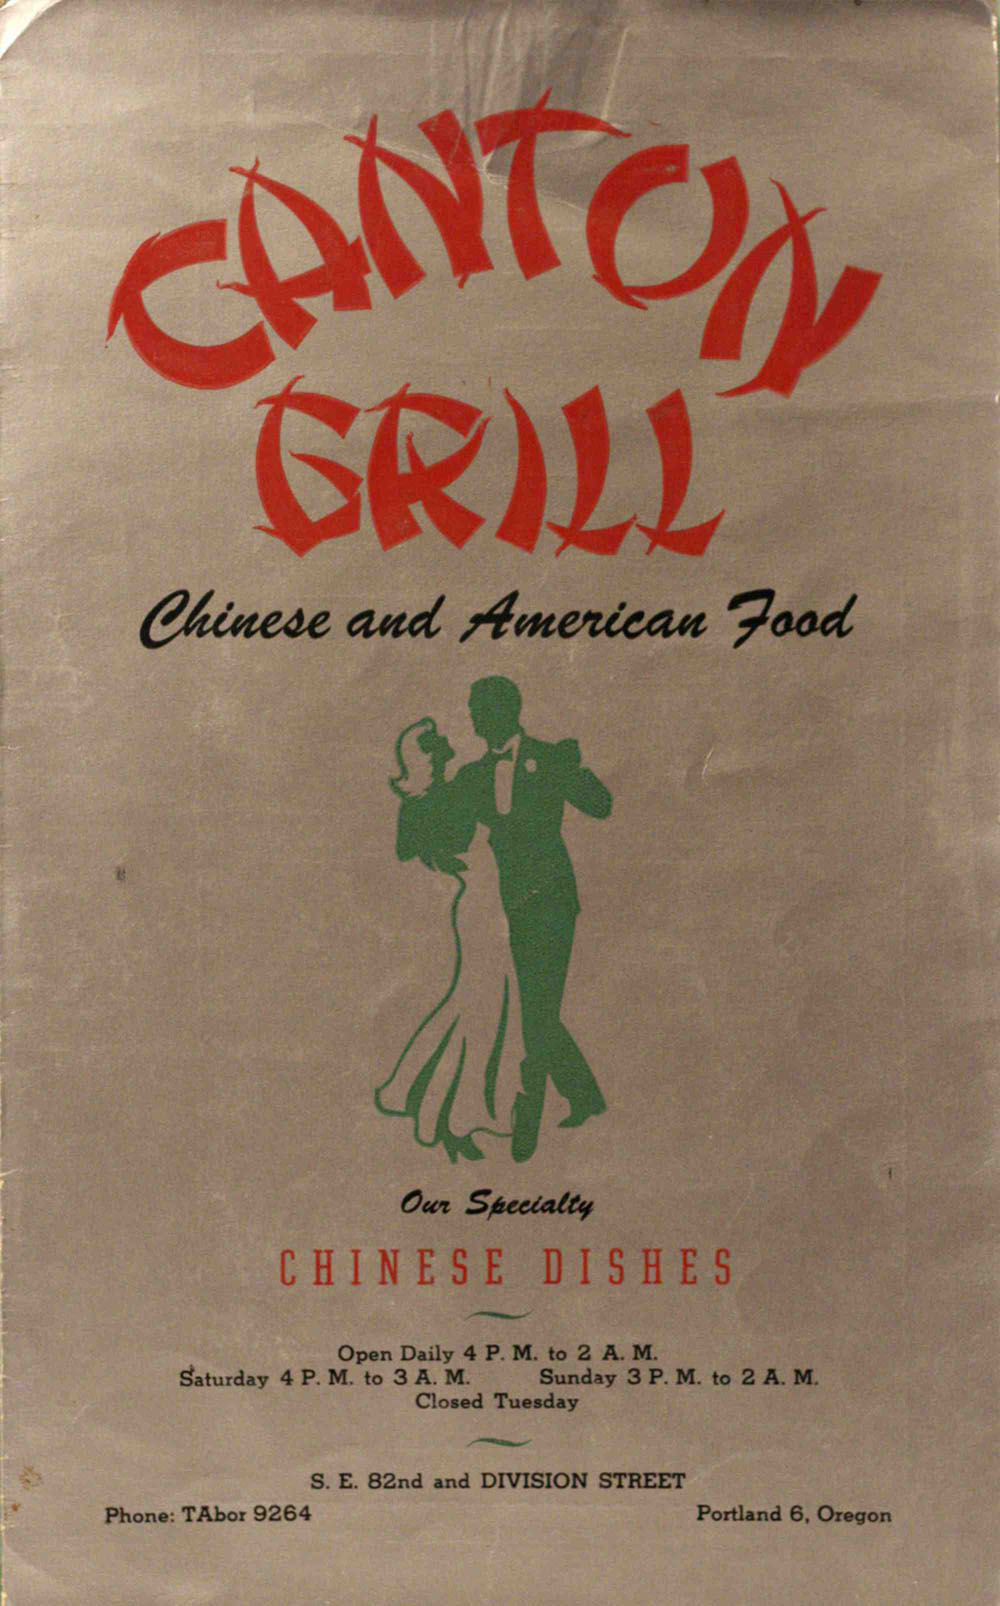 canton-grill-menu-portland-oregon